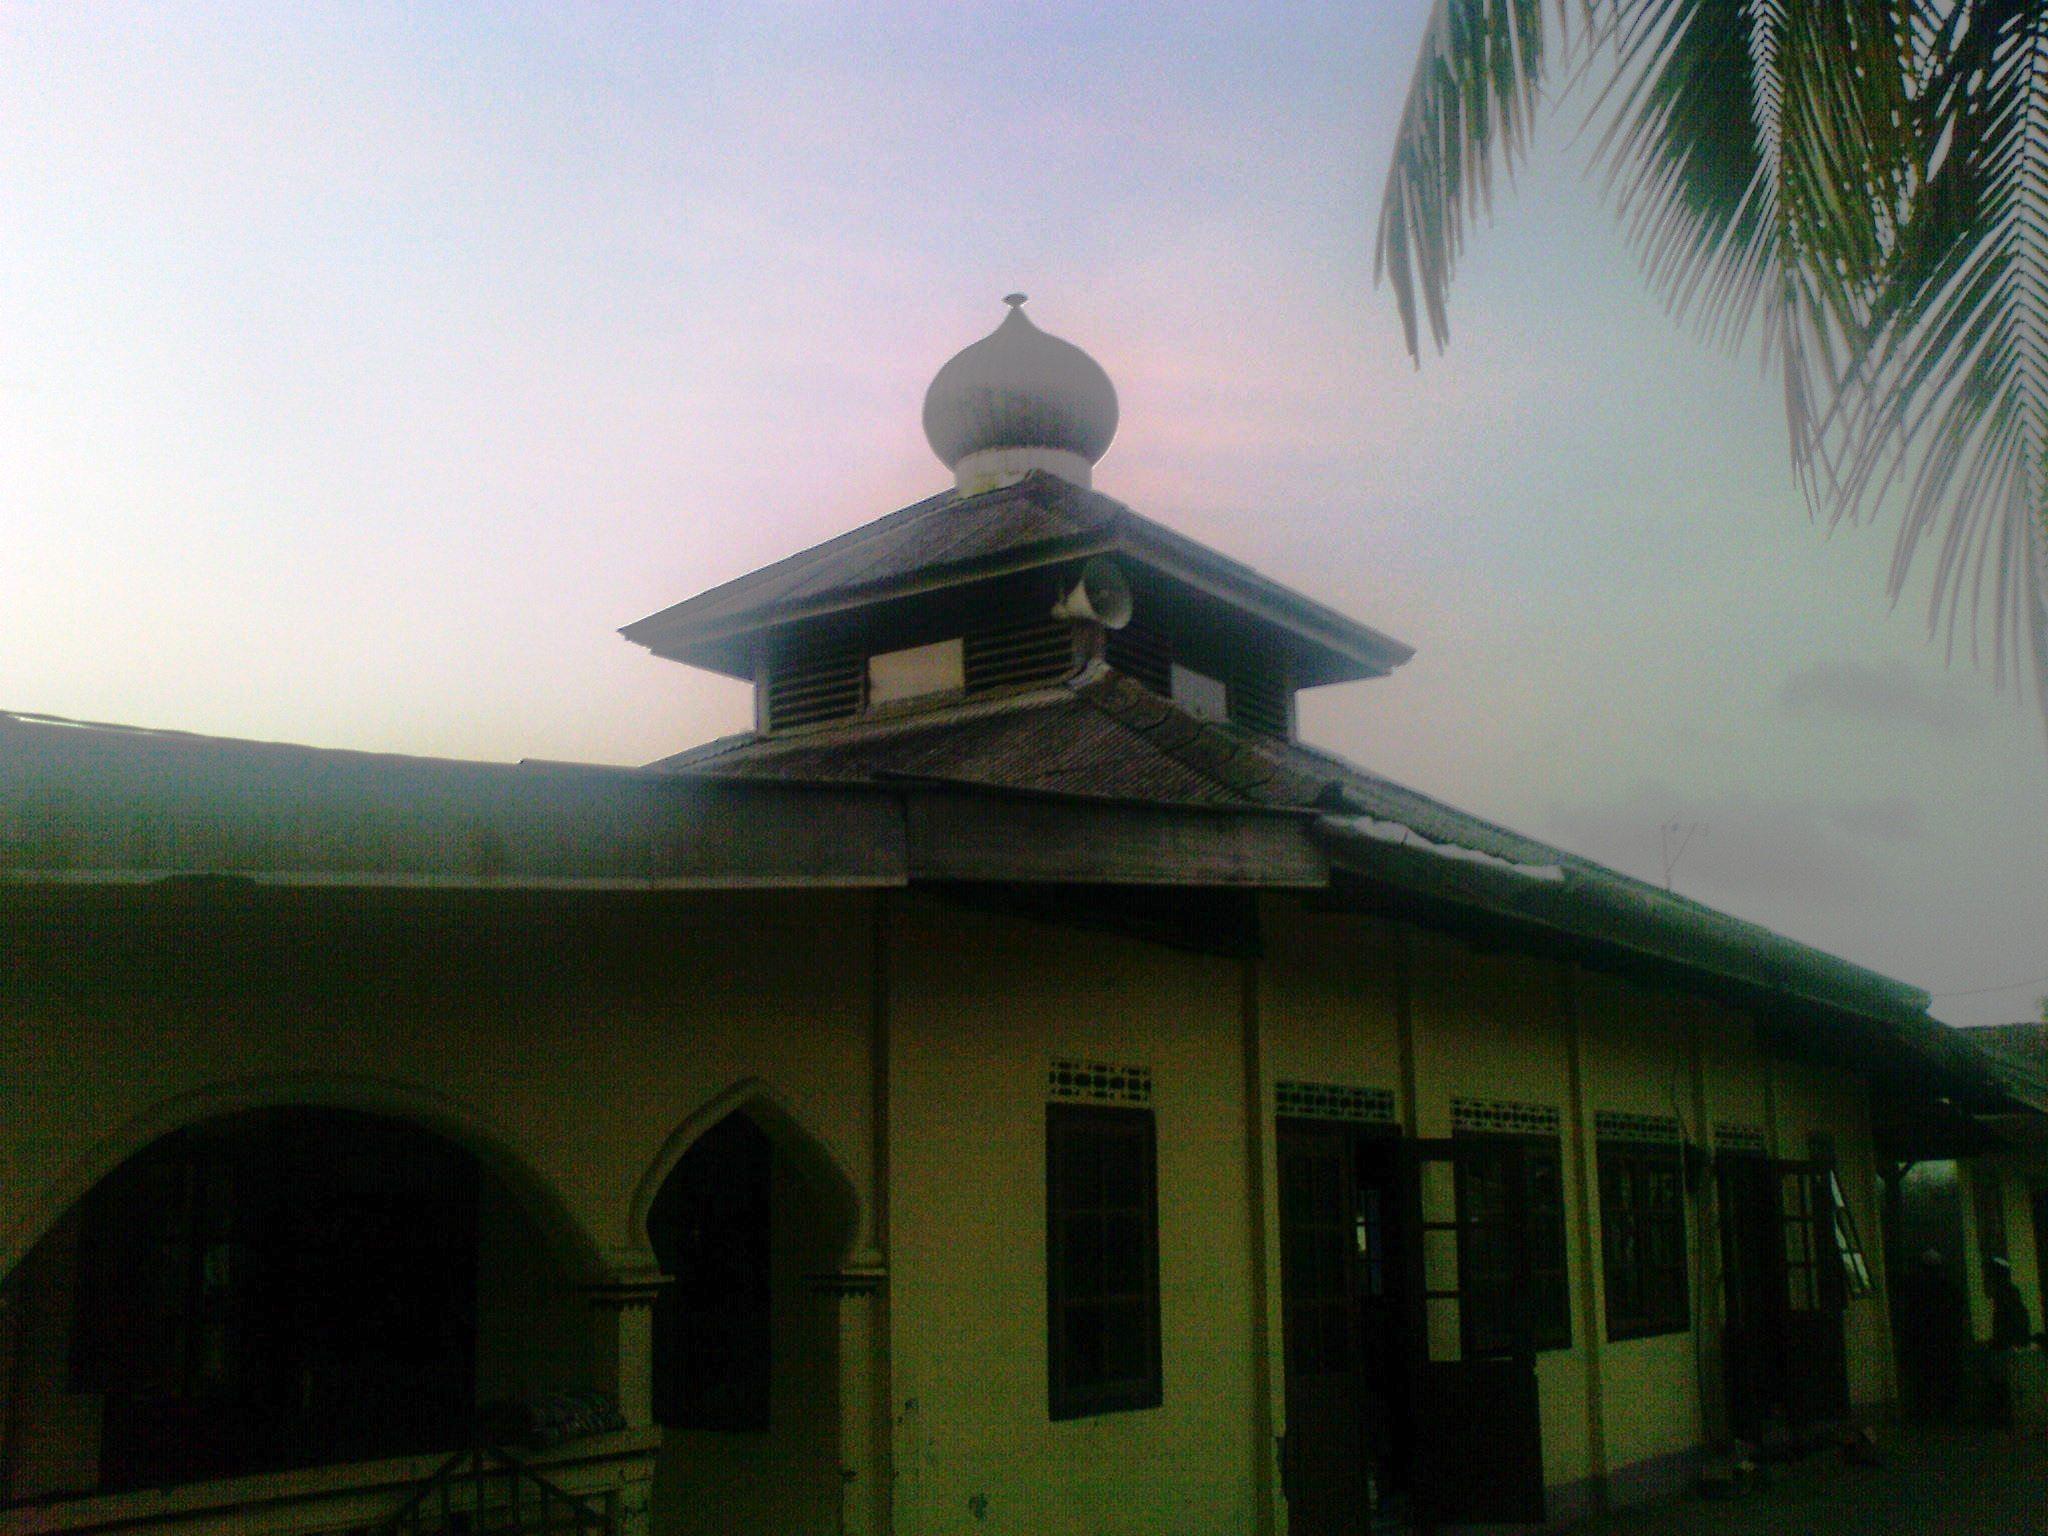 Masjid Al-Barokah Kampung Laut, Lokasi Kegiatan Dakwah dan Sosial